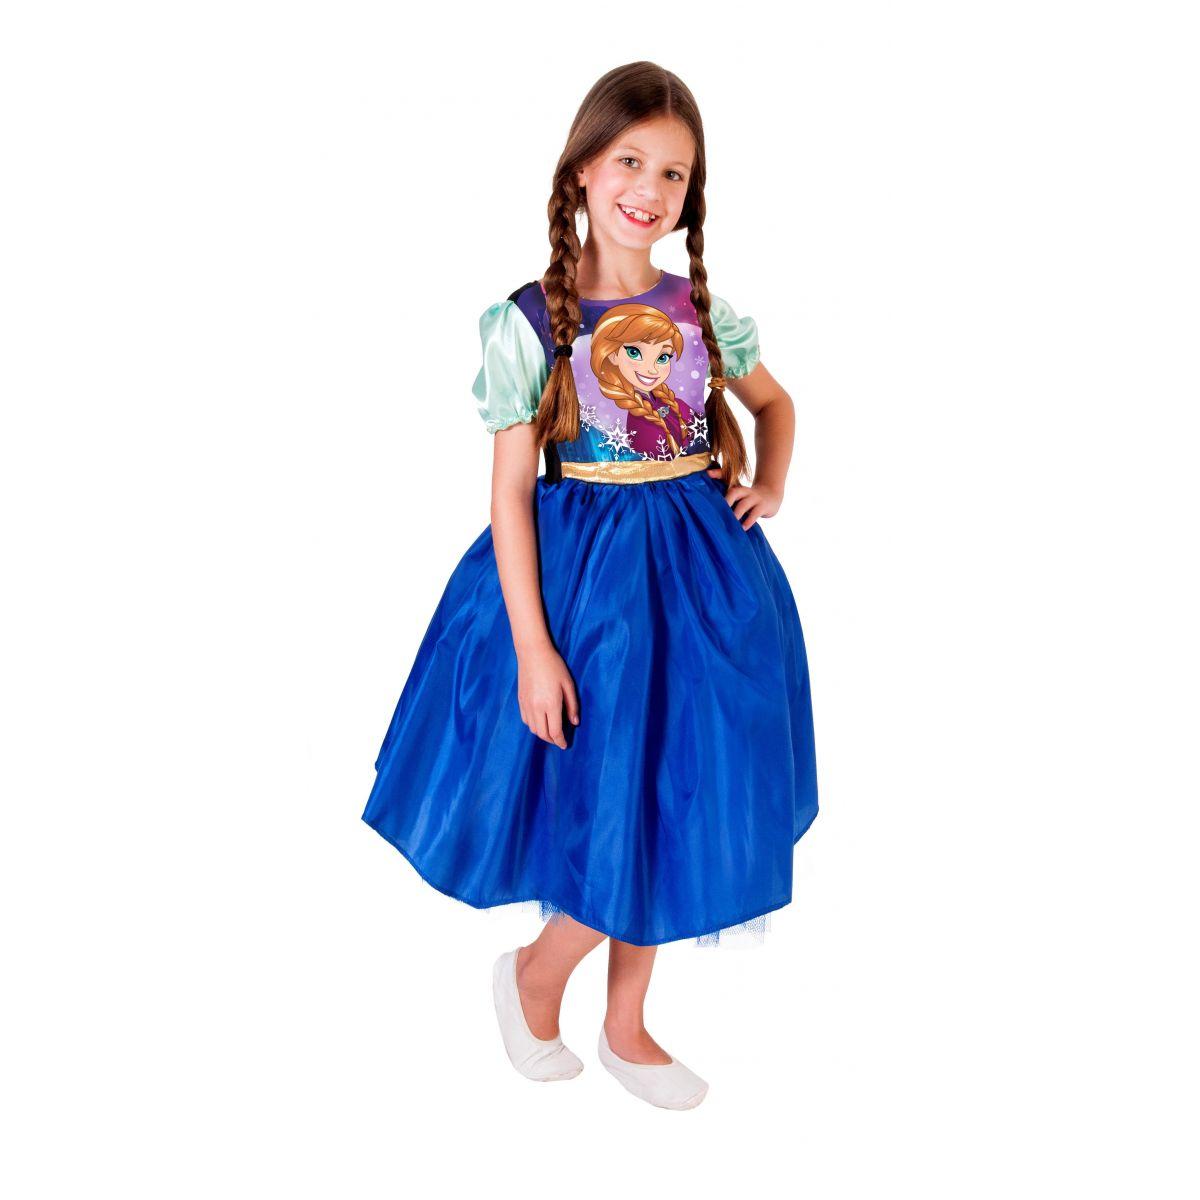 Fantasia Anna Frozen Infantil Vestido Standard Princesa Disney